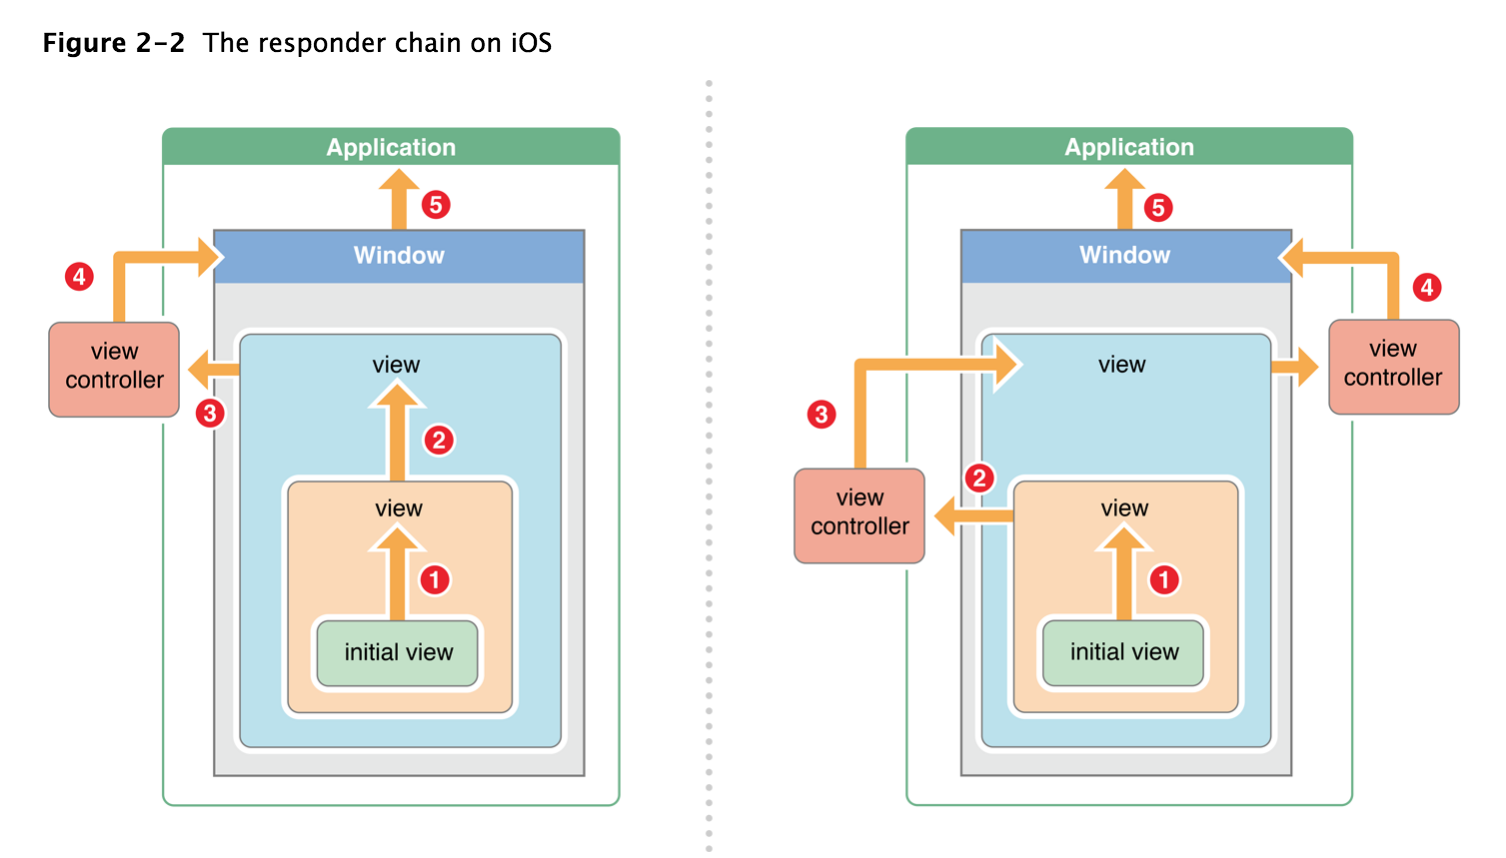 responder chain on iOS